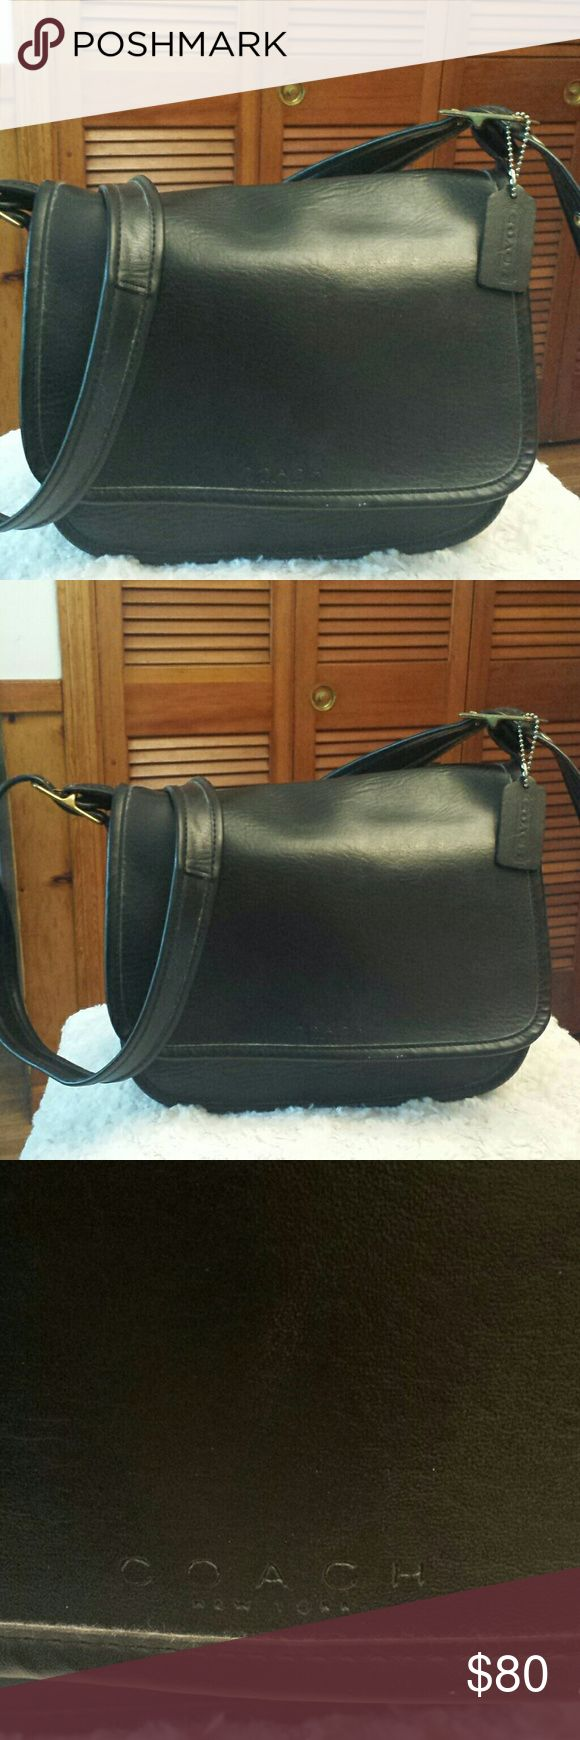 Coach Legacy Black Leather Crossbody Bag Coach Legacy Black Leather Crossbody Bag, Creed 9956,Slip pocket outside, Slip pocket inside, Front pocket, Zipper closure, Good condition Coach  Bags Crossbody Bags